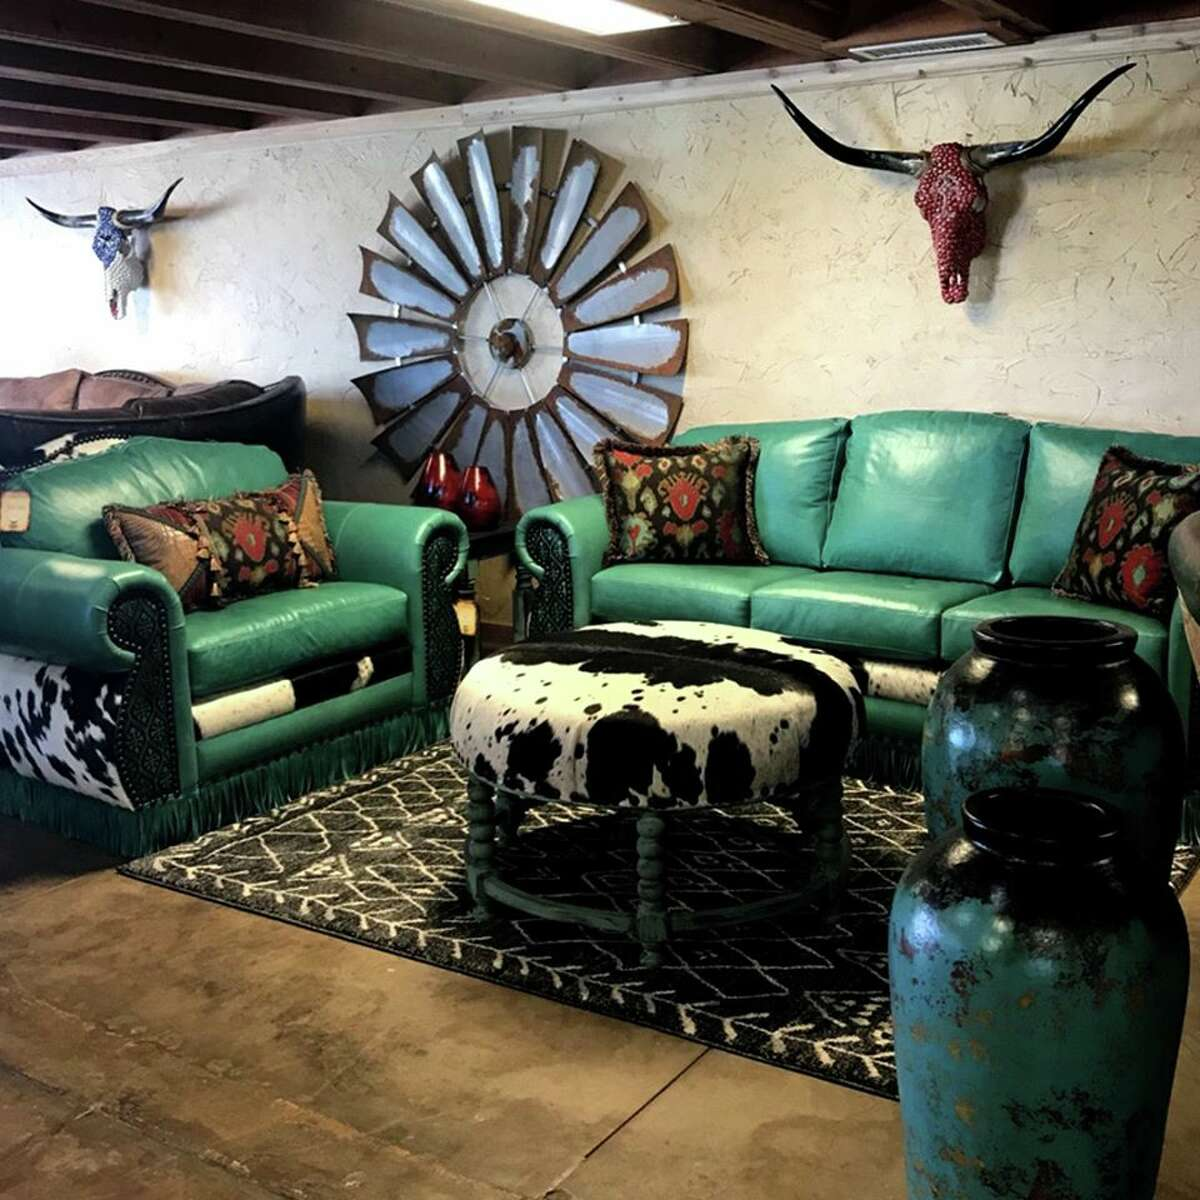 Cowhide Western Furniture Co.Custom wood and leather furniture Photo courtesy: Cowhide Western Furniture Co./Facebook